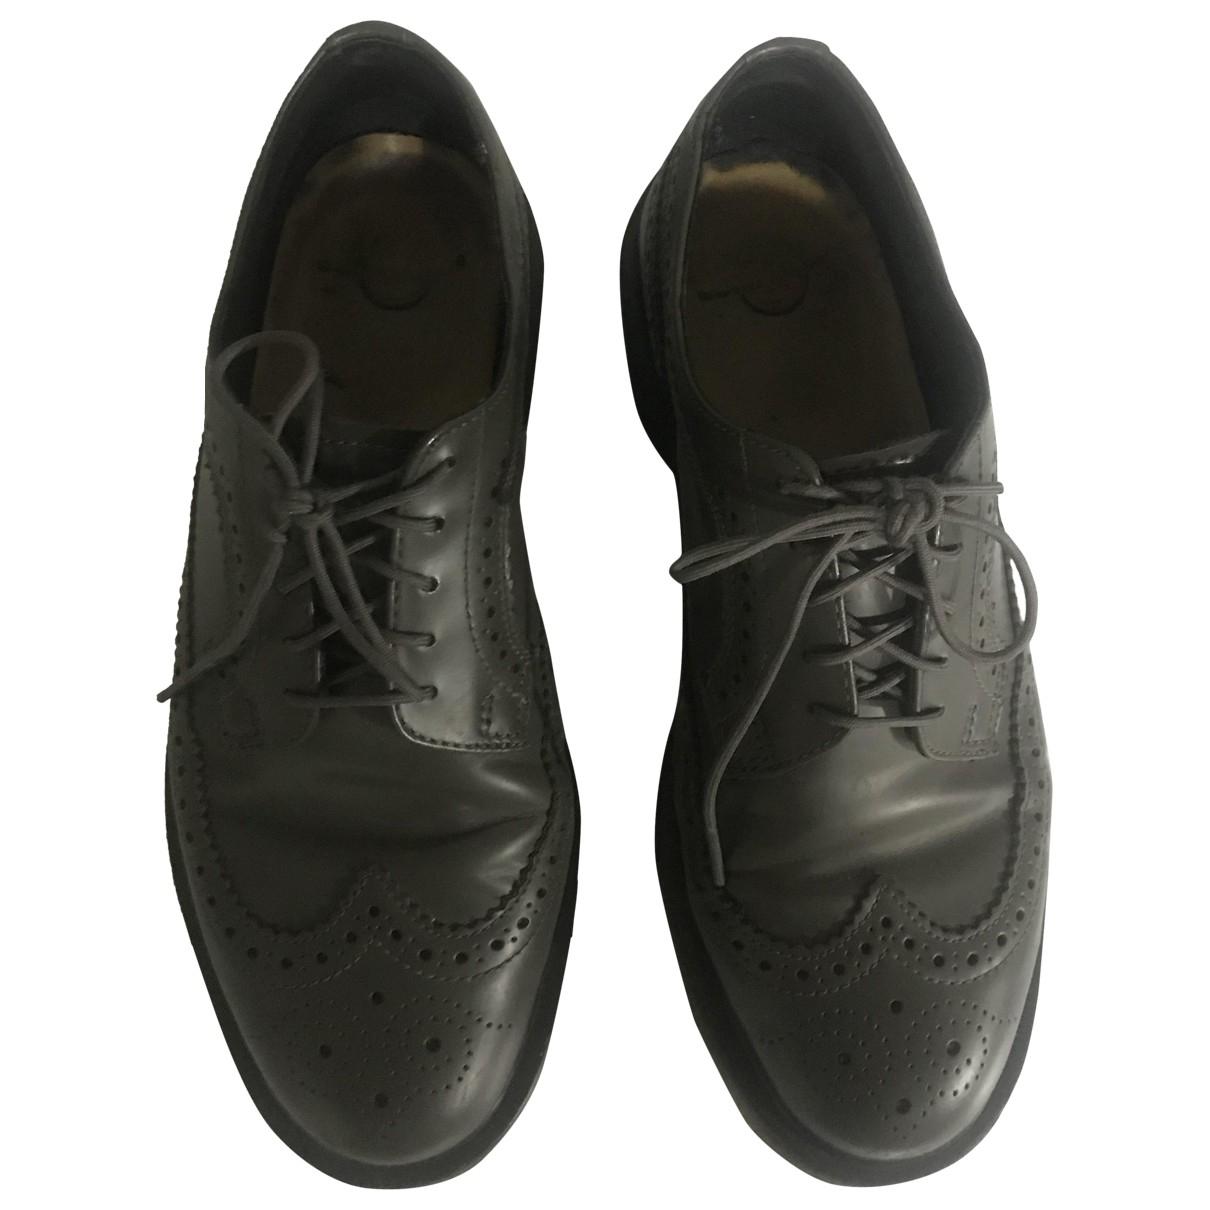 Dr. Martens 3989 (Brogue) Grey Leather Lace ups for Men 42 EU